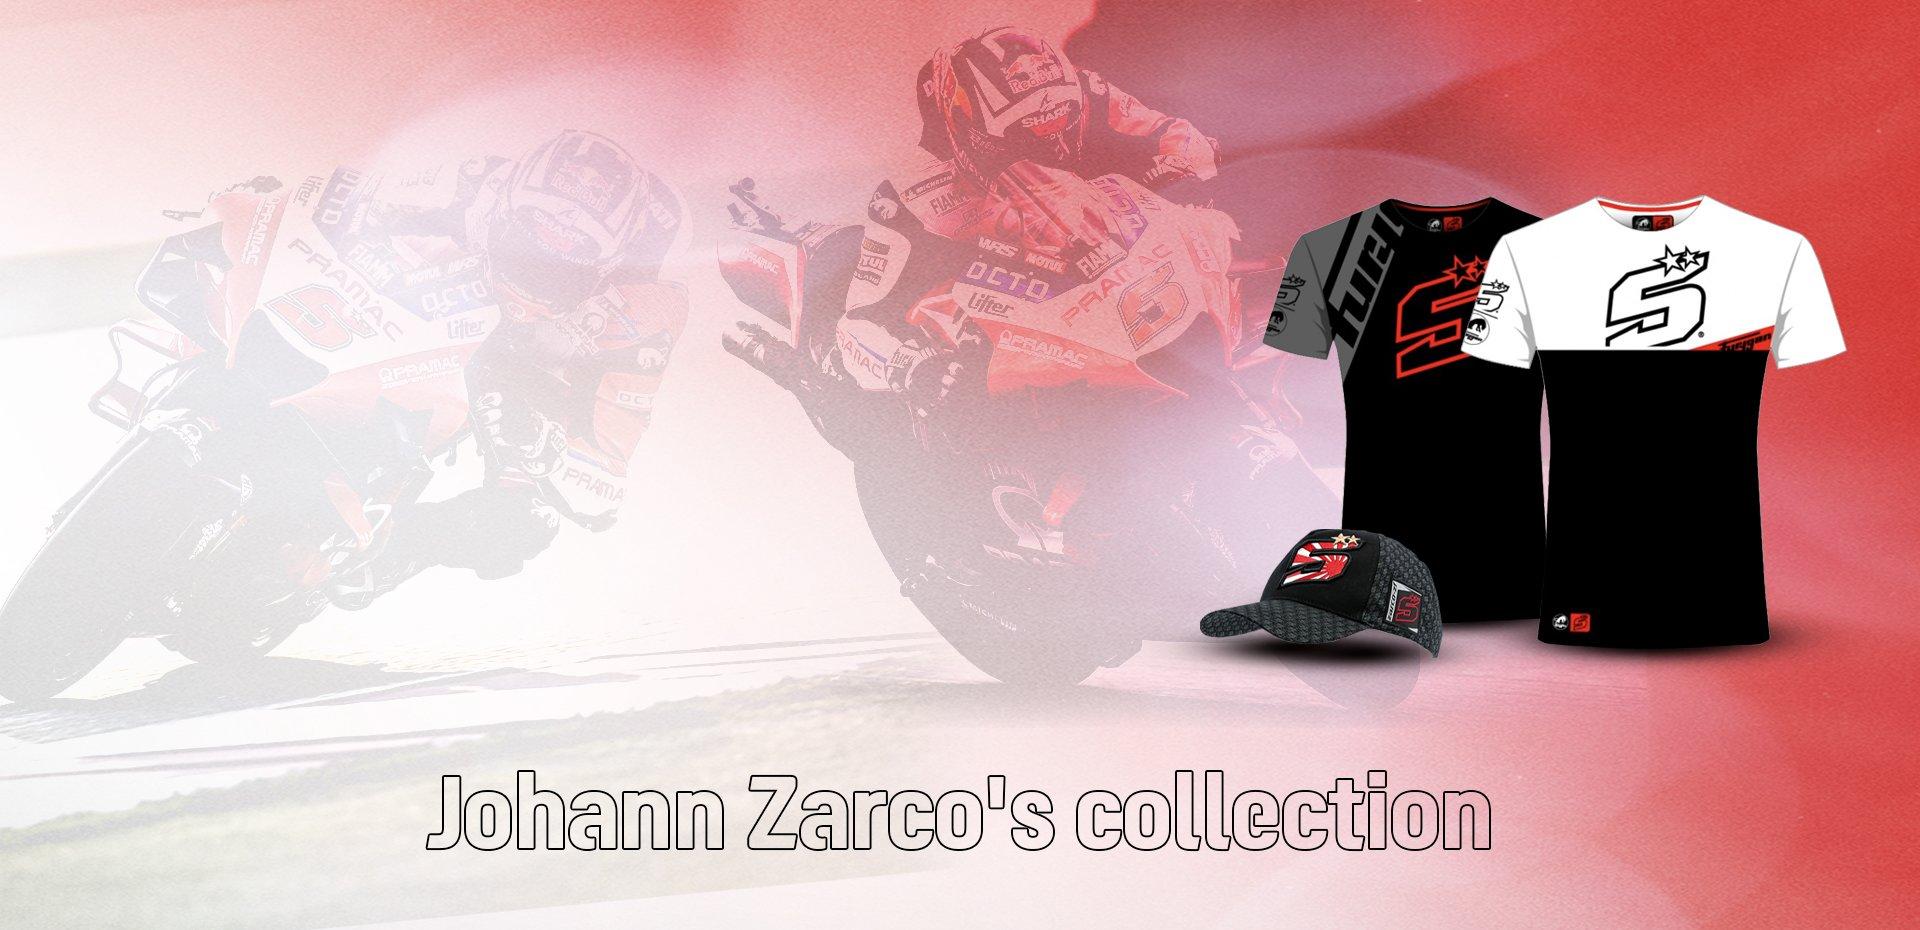 Johann Zarco's collection